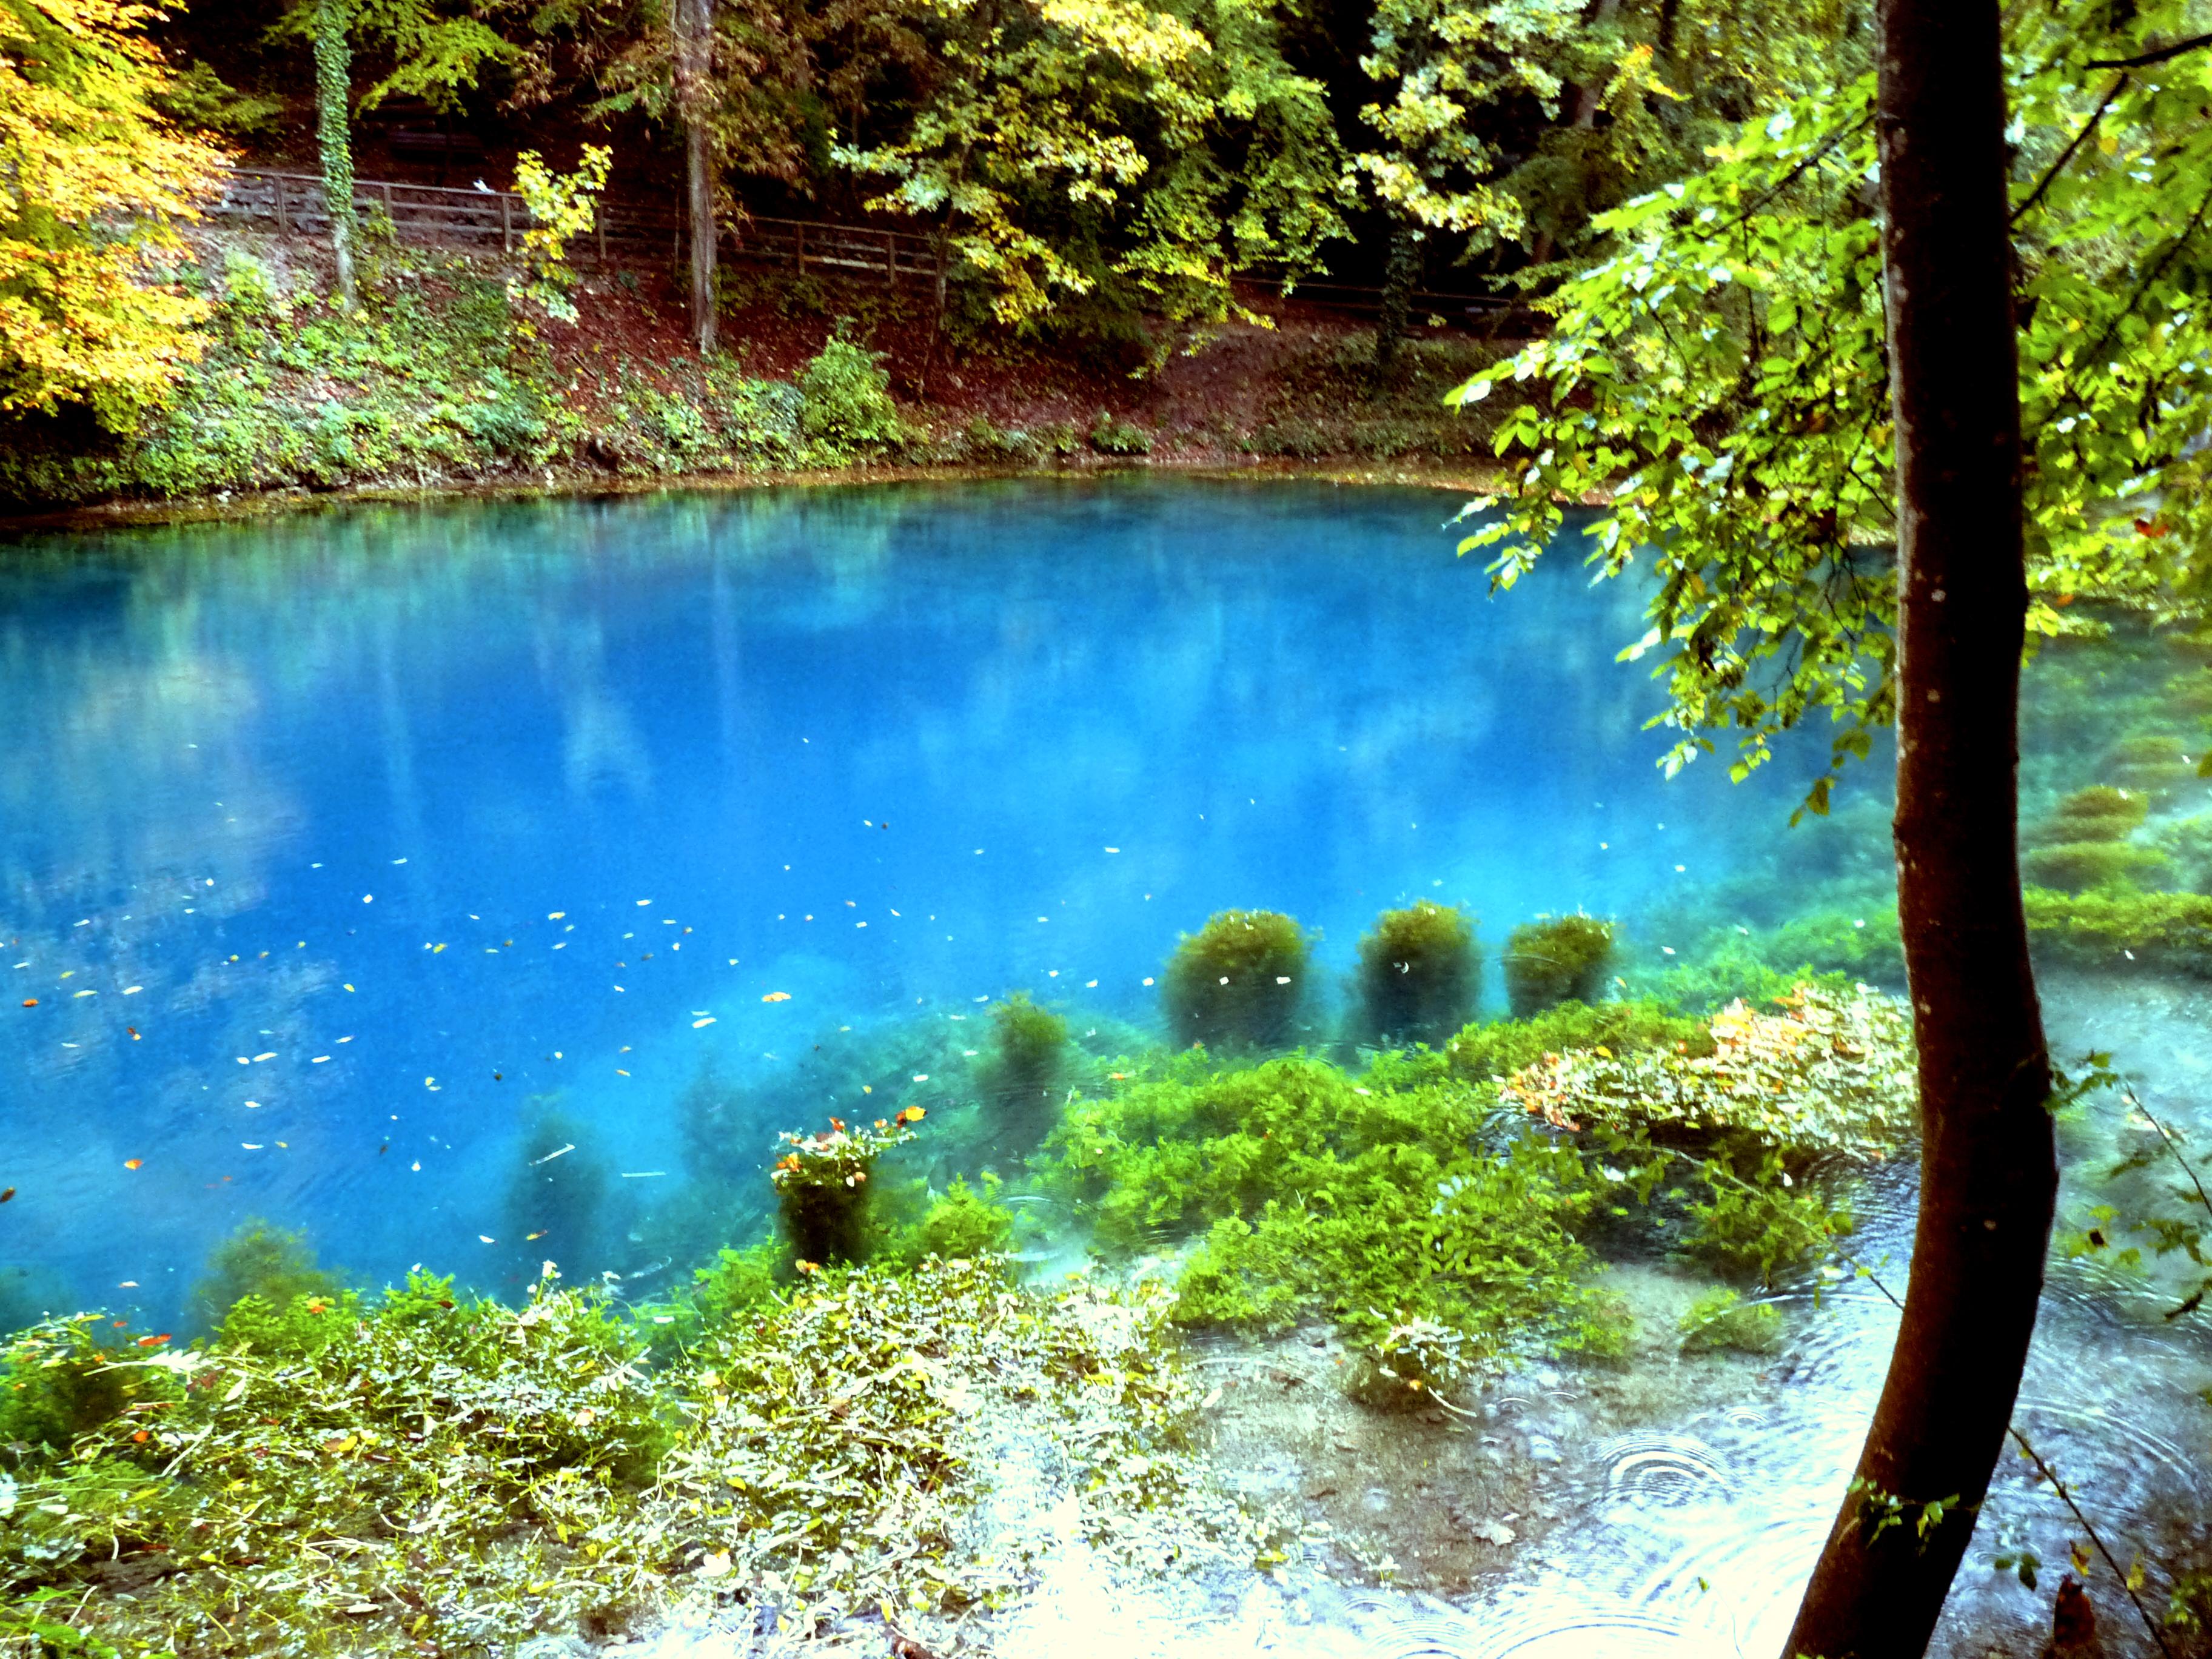 Natural Images Lake Jackson Tx